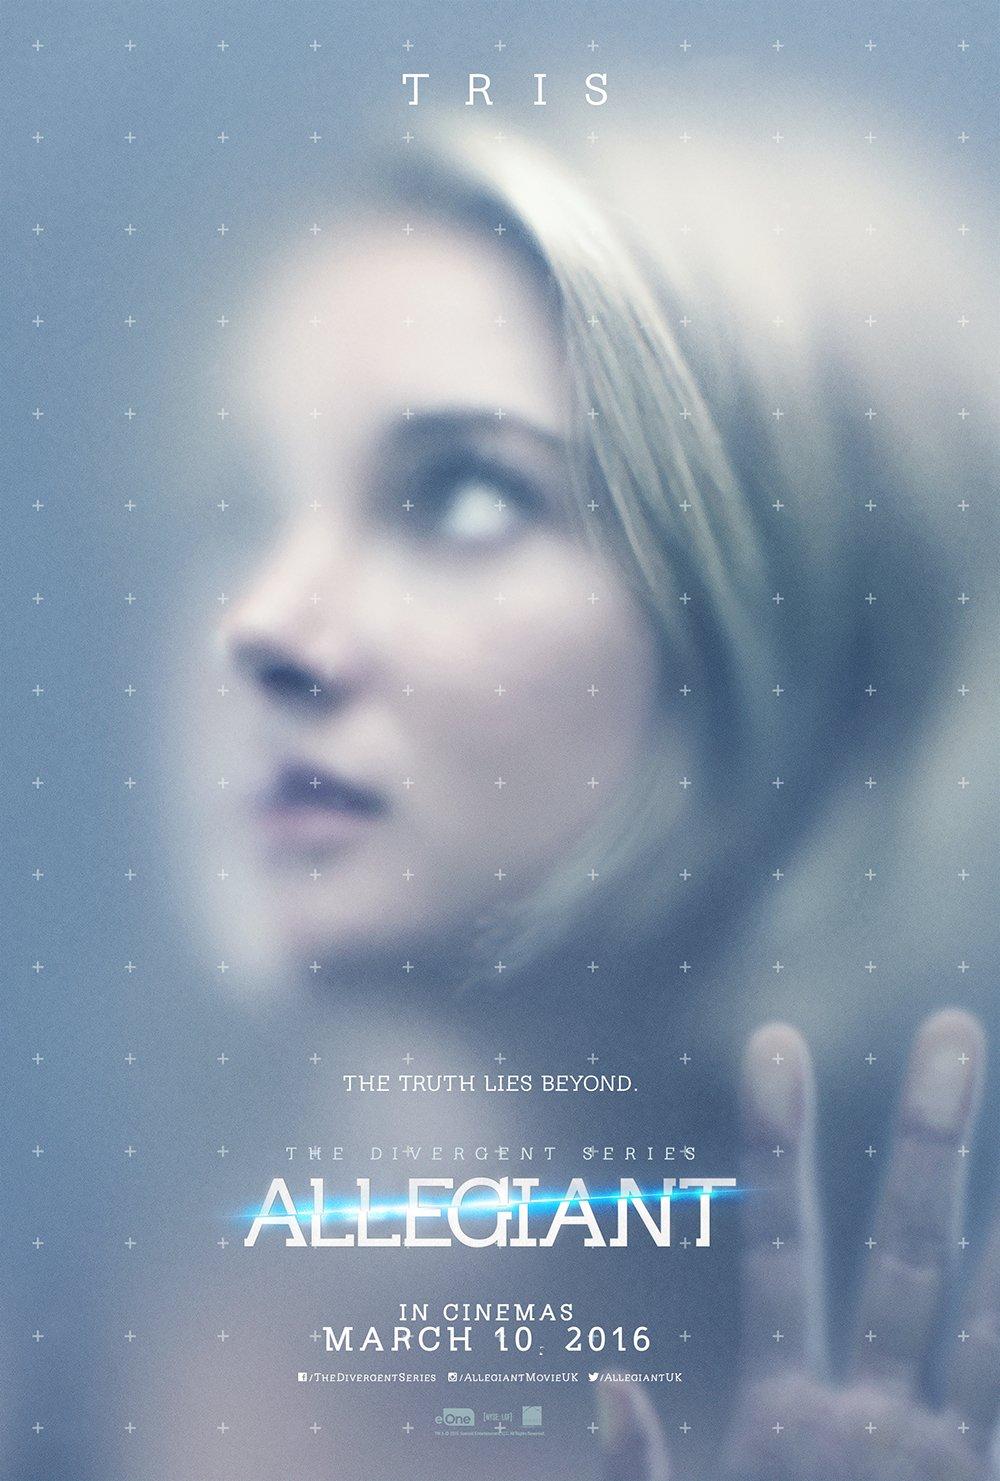 Allegiant – Tris Character Poster – UK Final